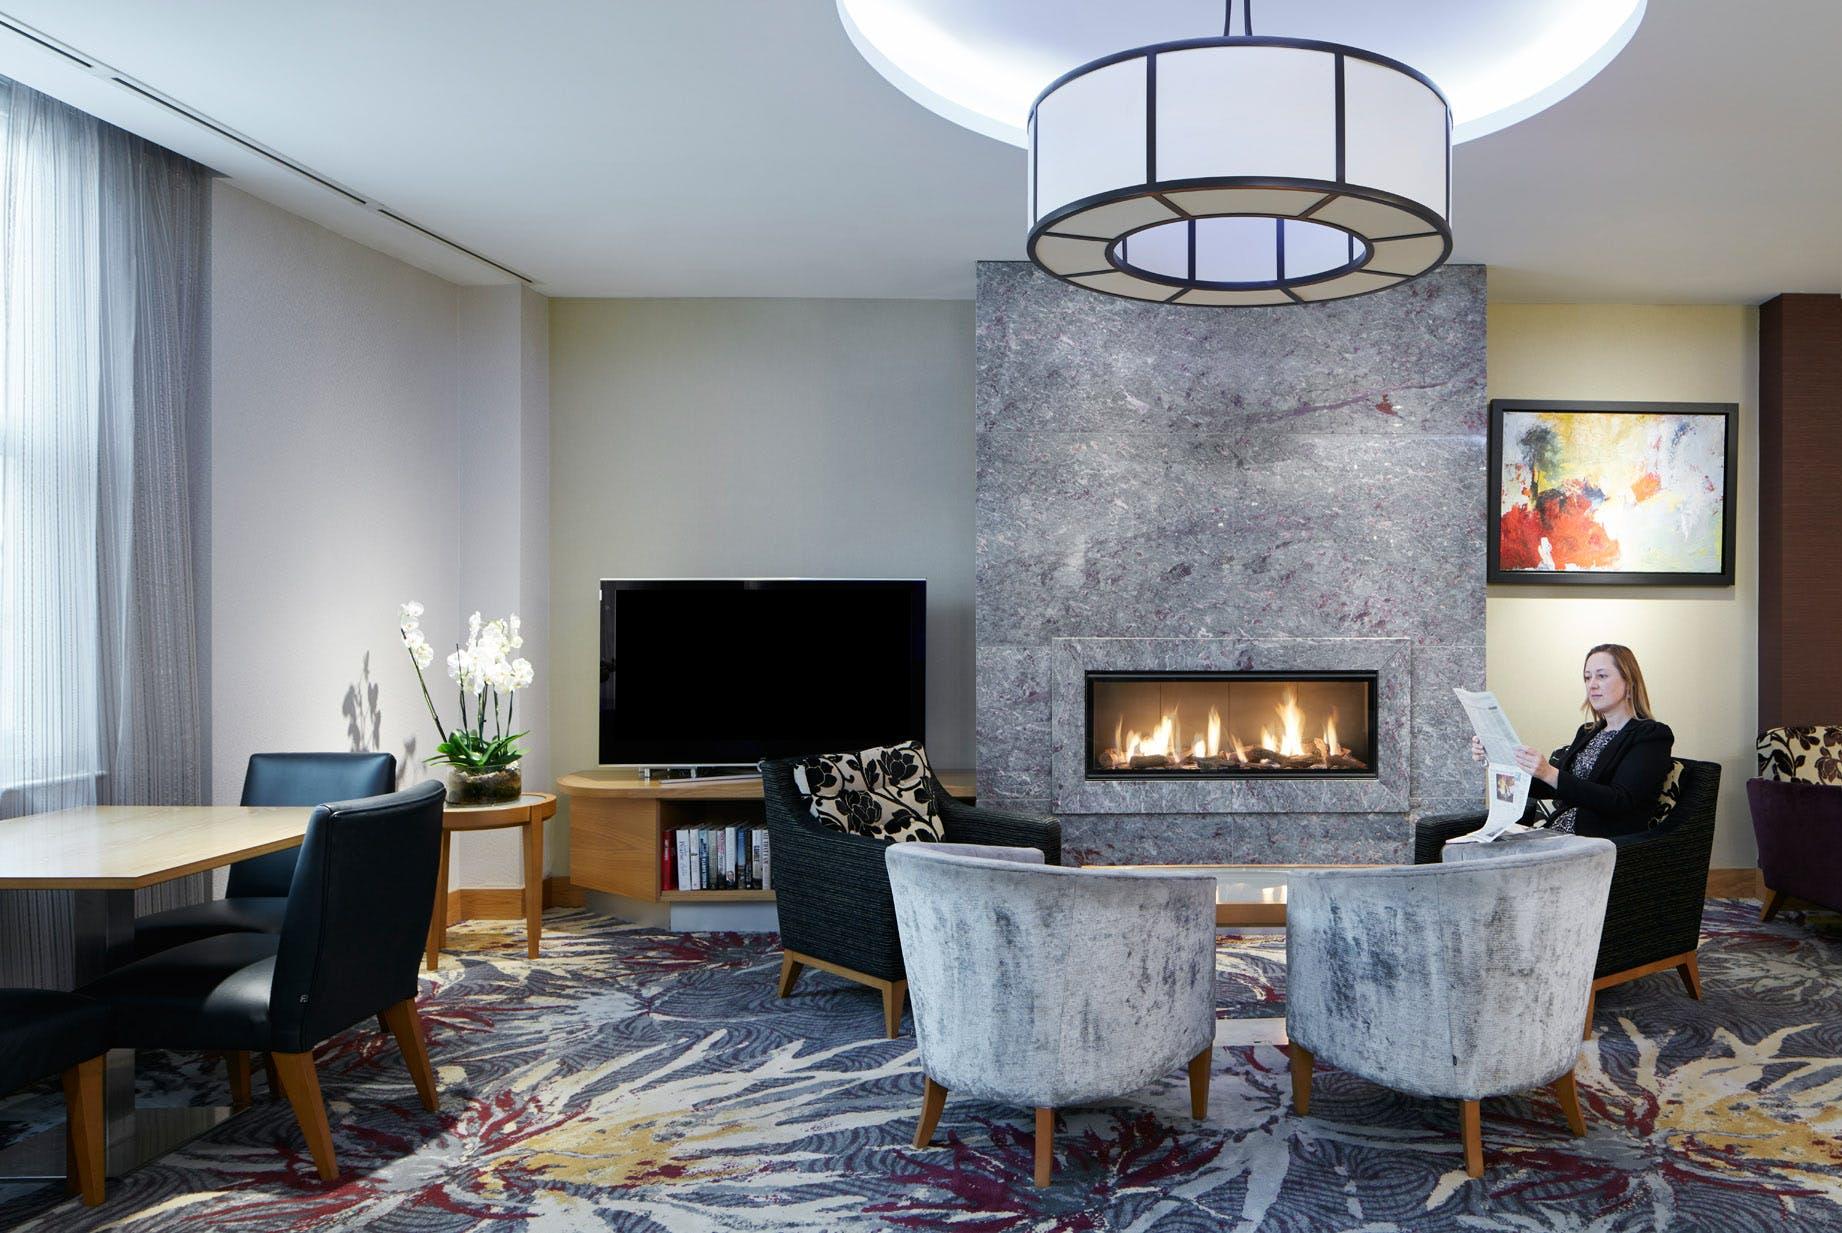 Club Living Room at Club Quarters Hotel, Lincoln's Inn Fields-Holborn, London